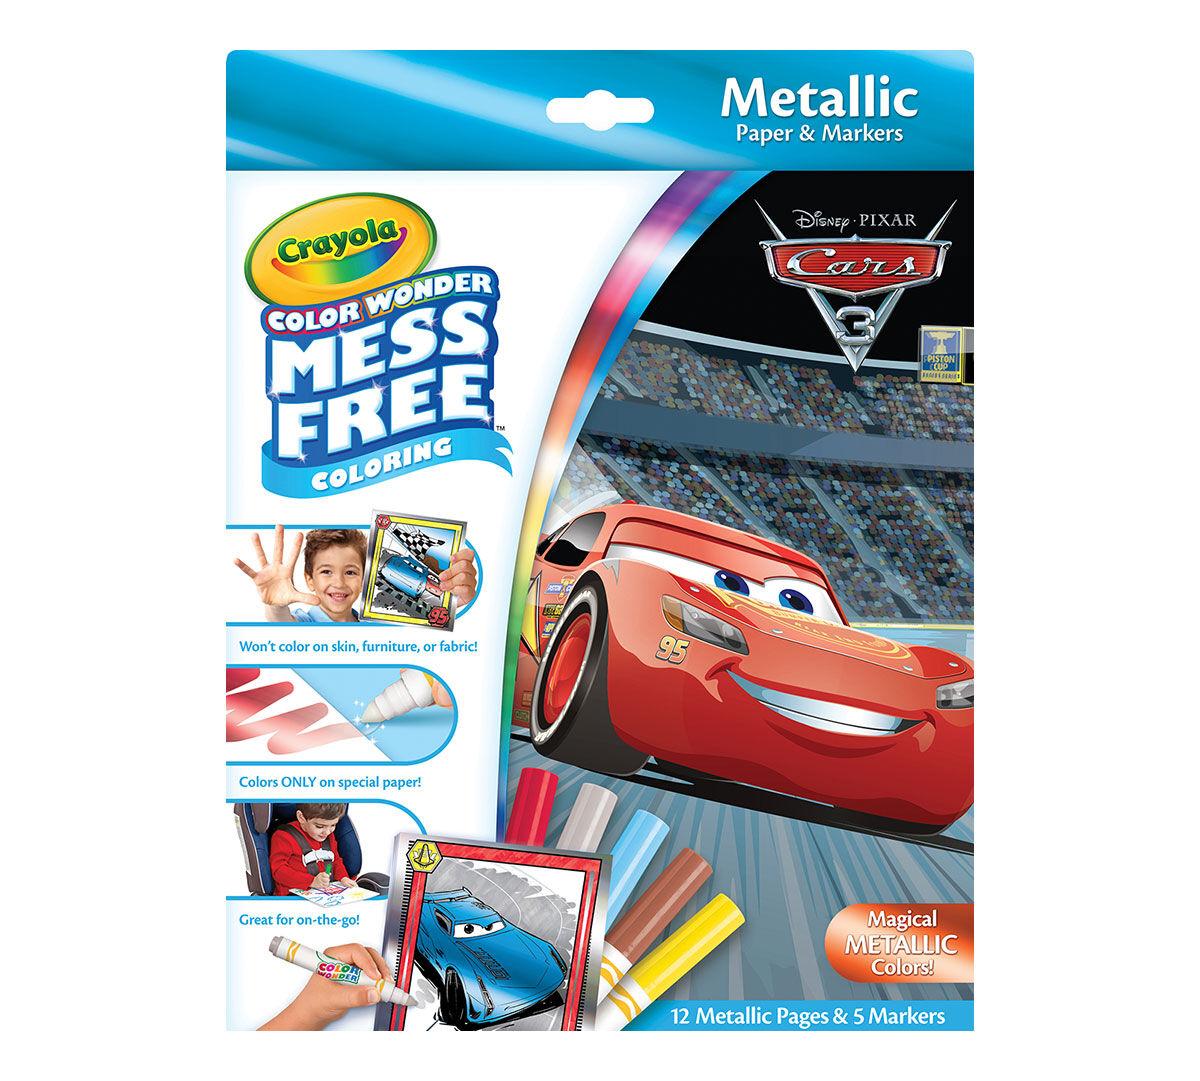 Color Wonder Mess Free Metallic Paper & Markers, Disney's Pixar Cars 3  Crayola